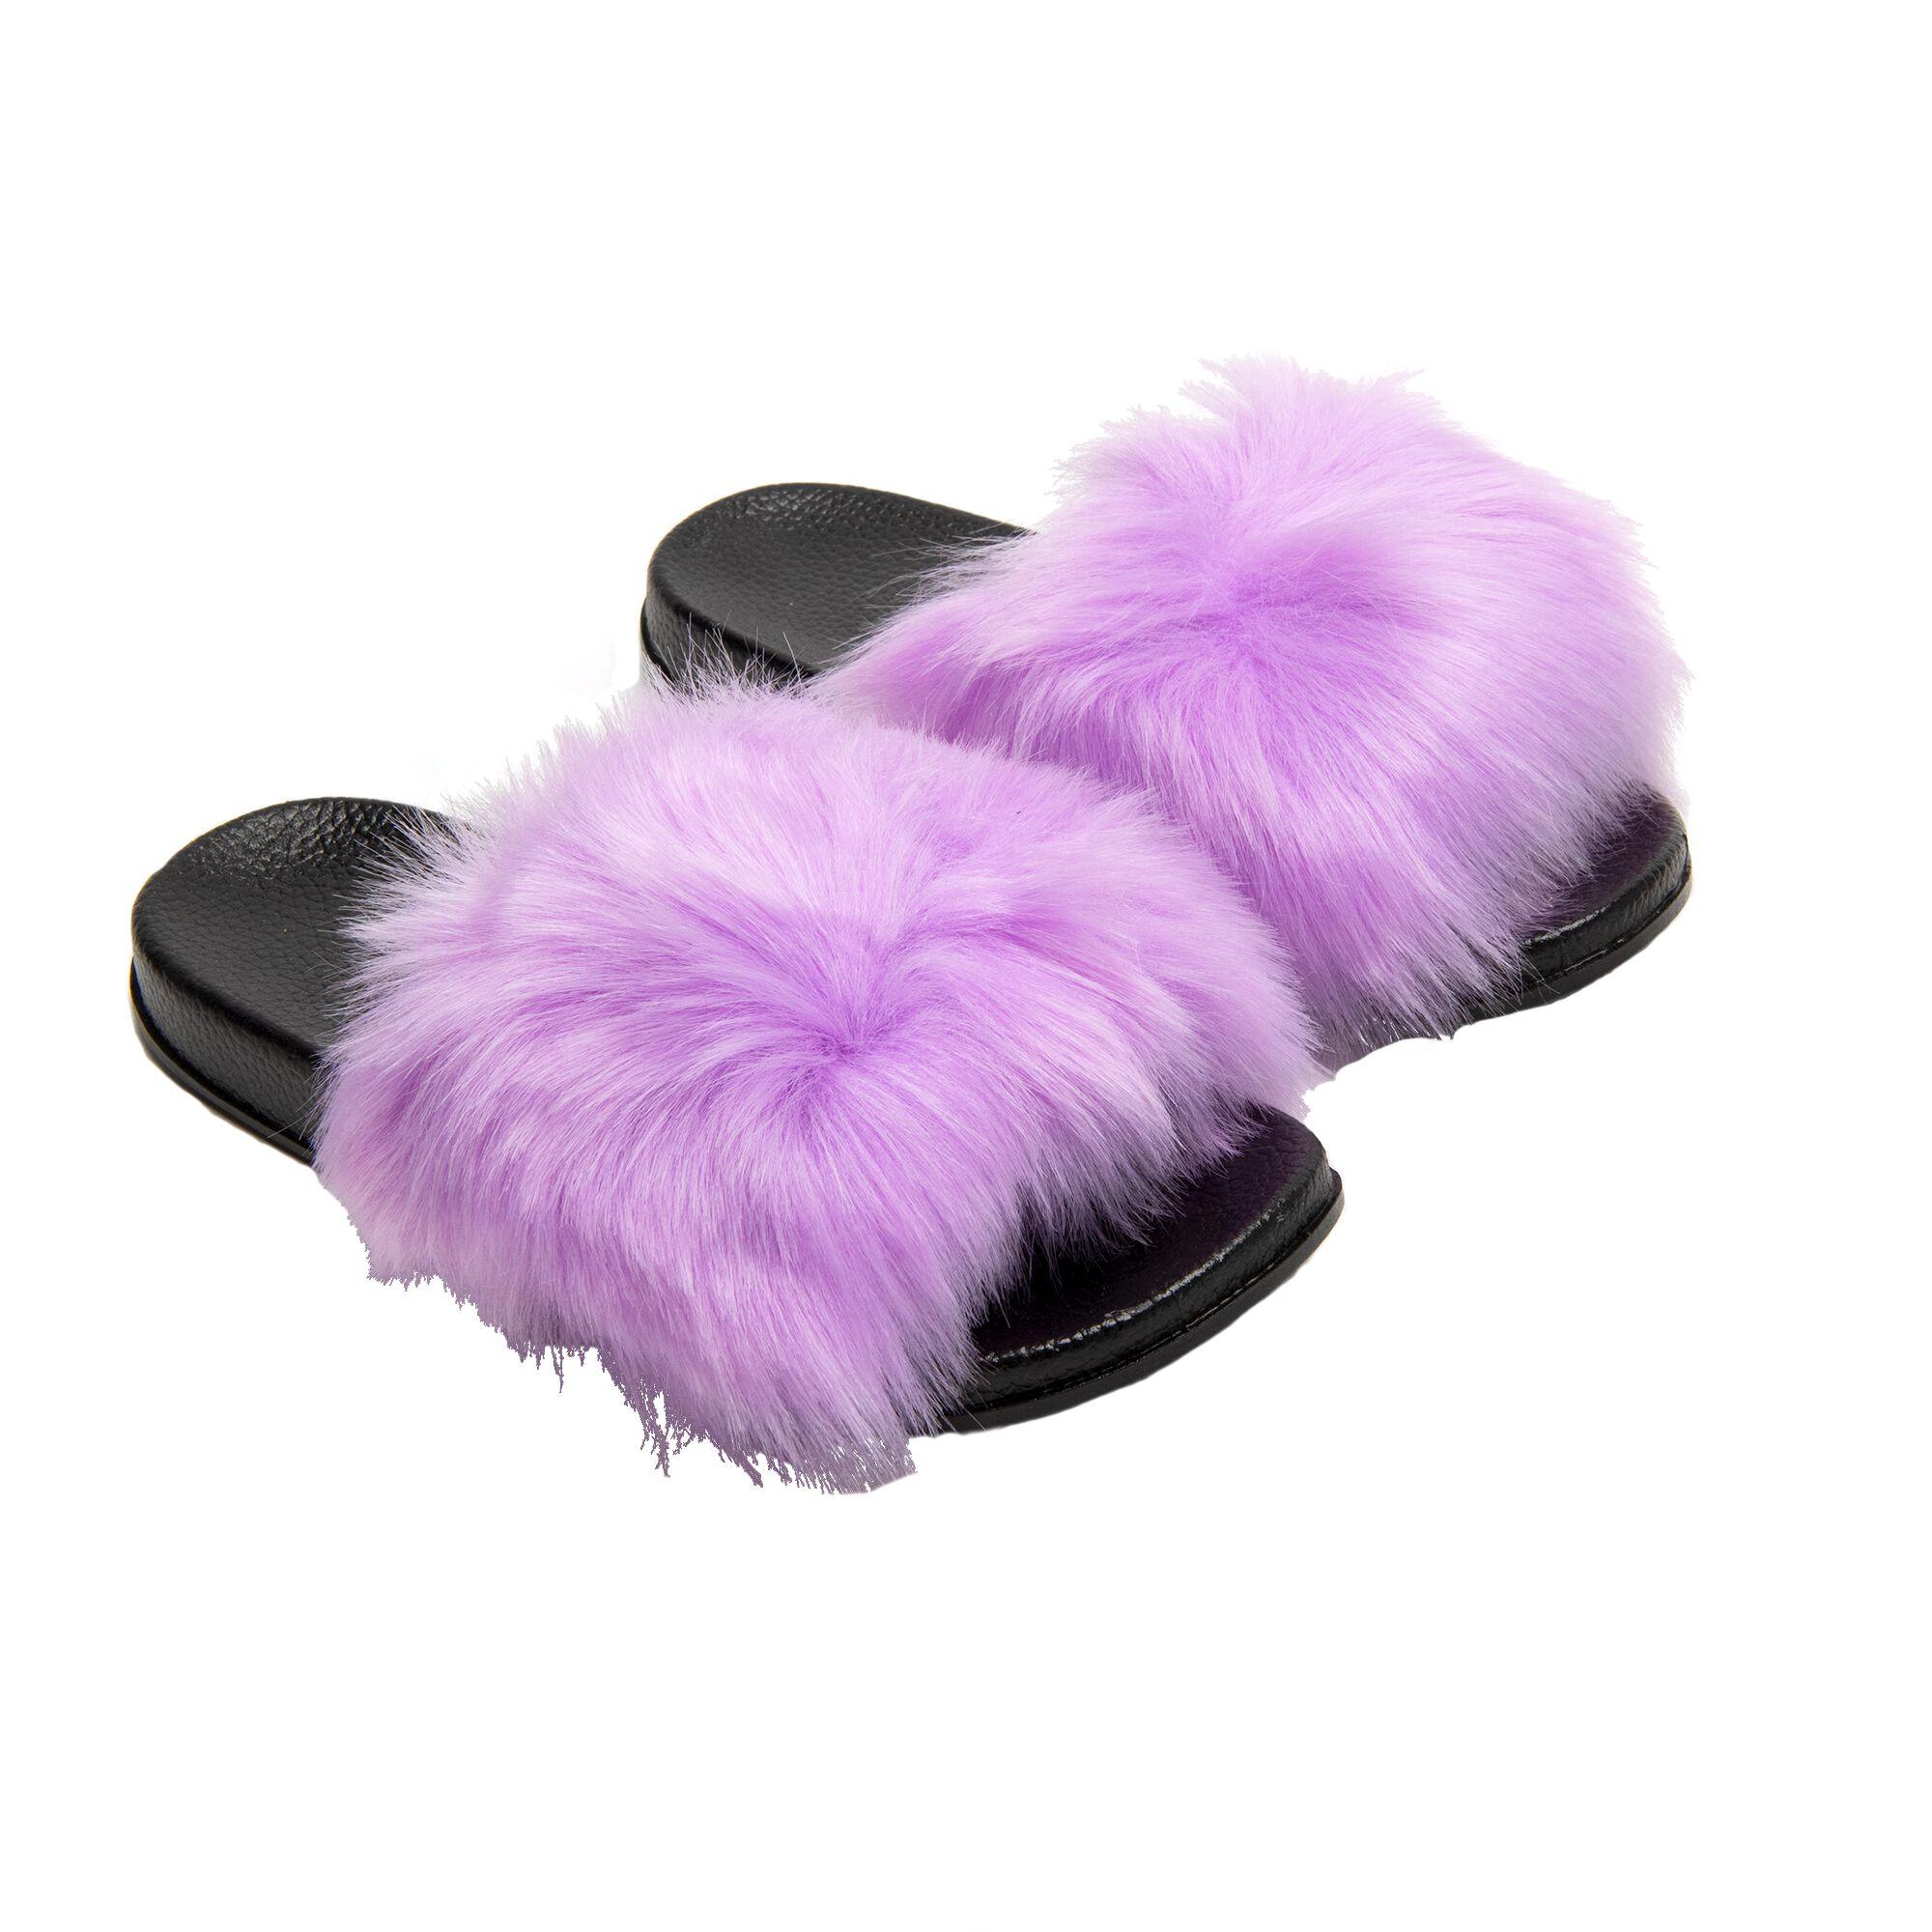 Fuzzy Slippers Size 39